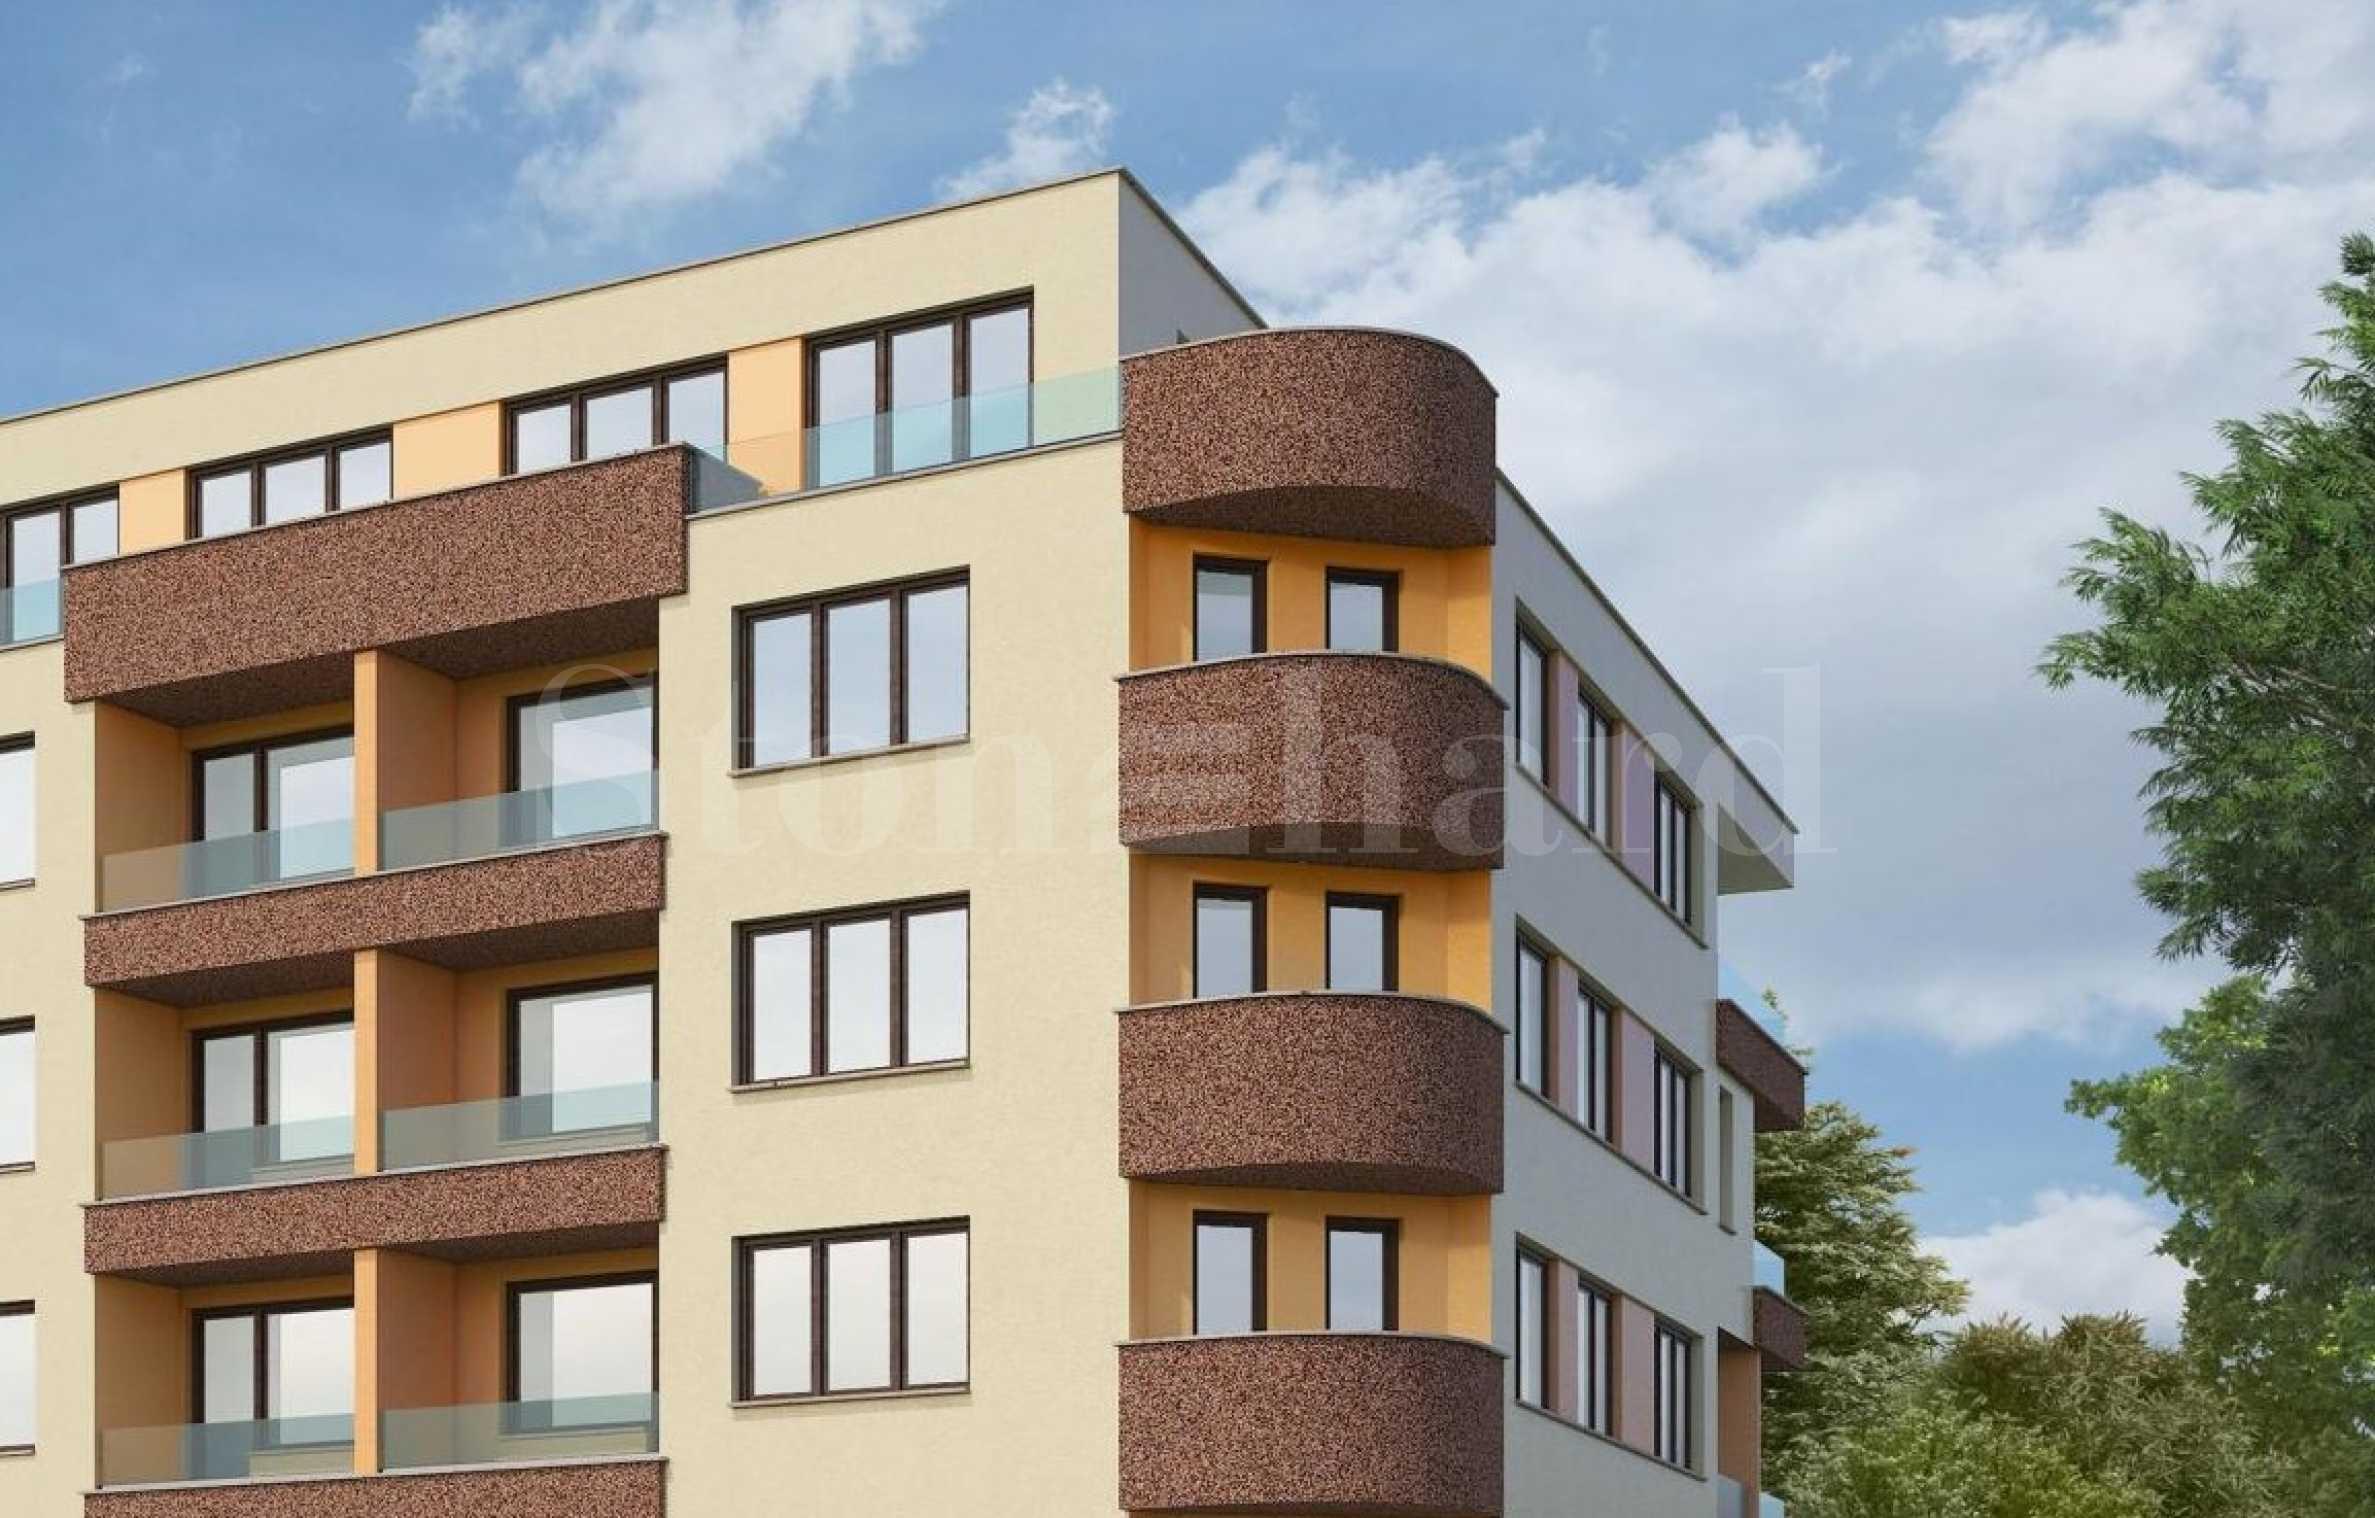 New residential building in the beginning of Hadji Dimitar2 - Stonehard